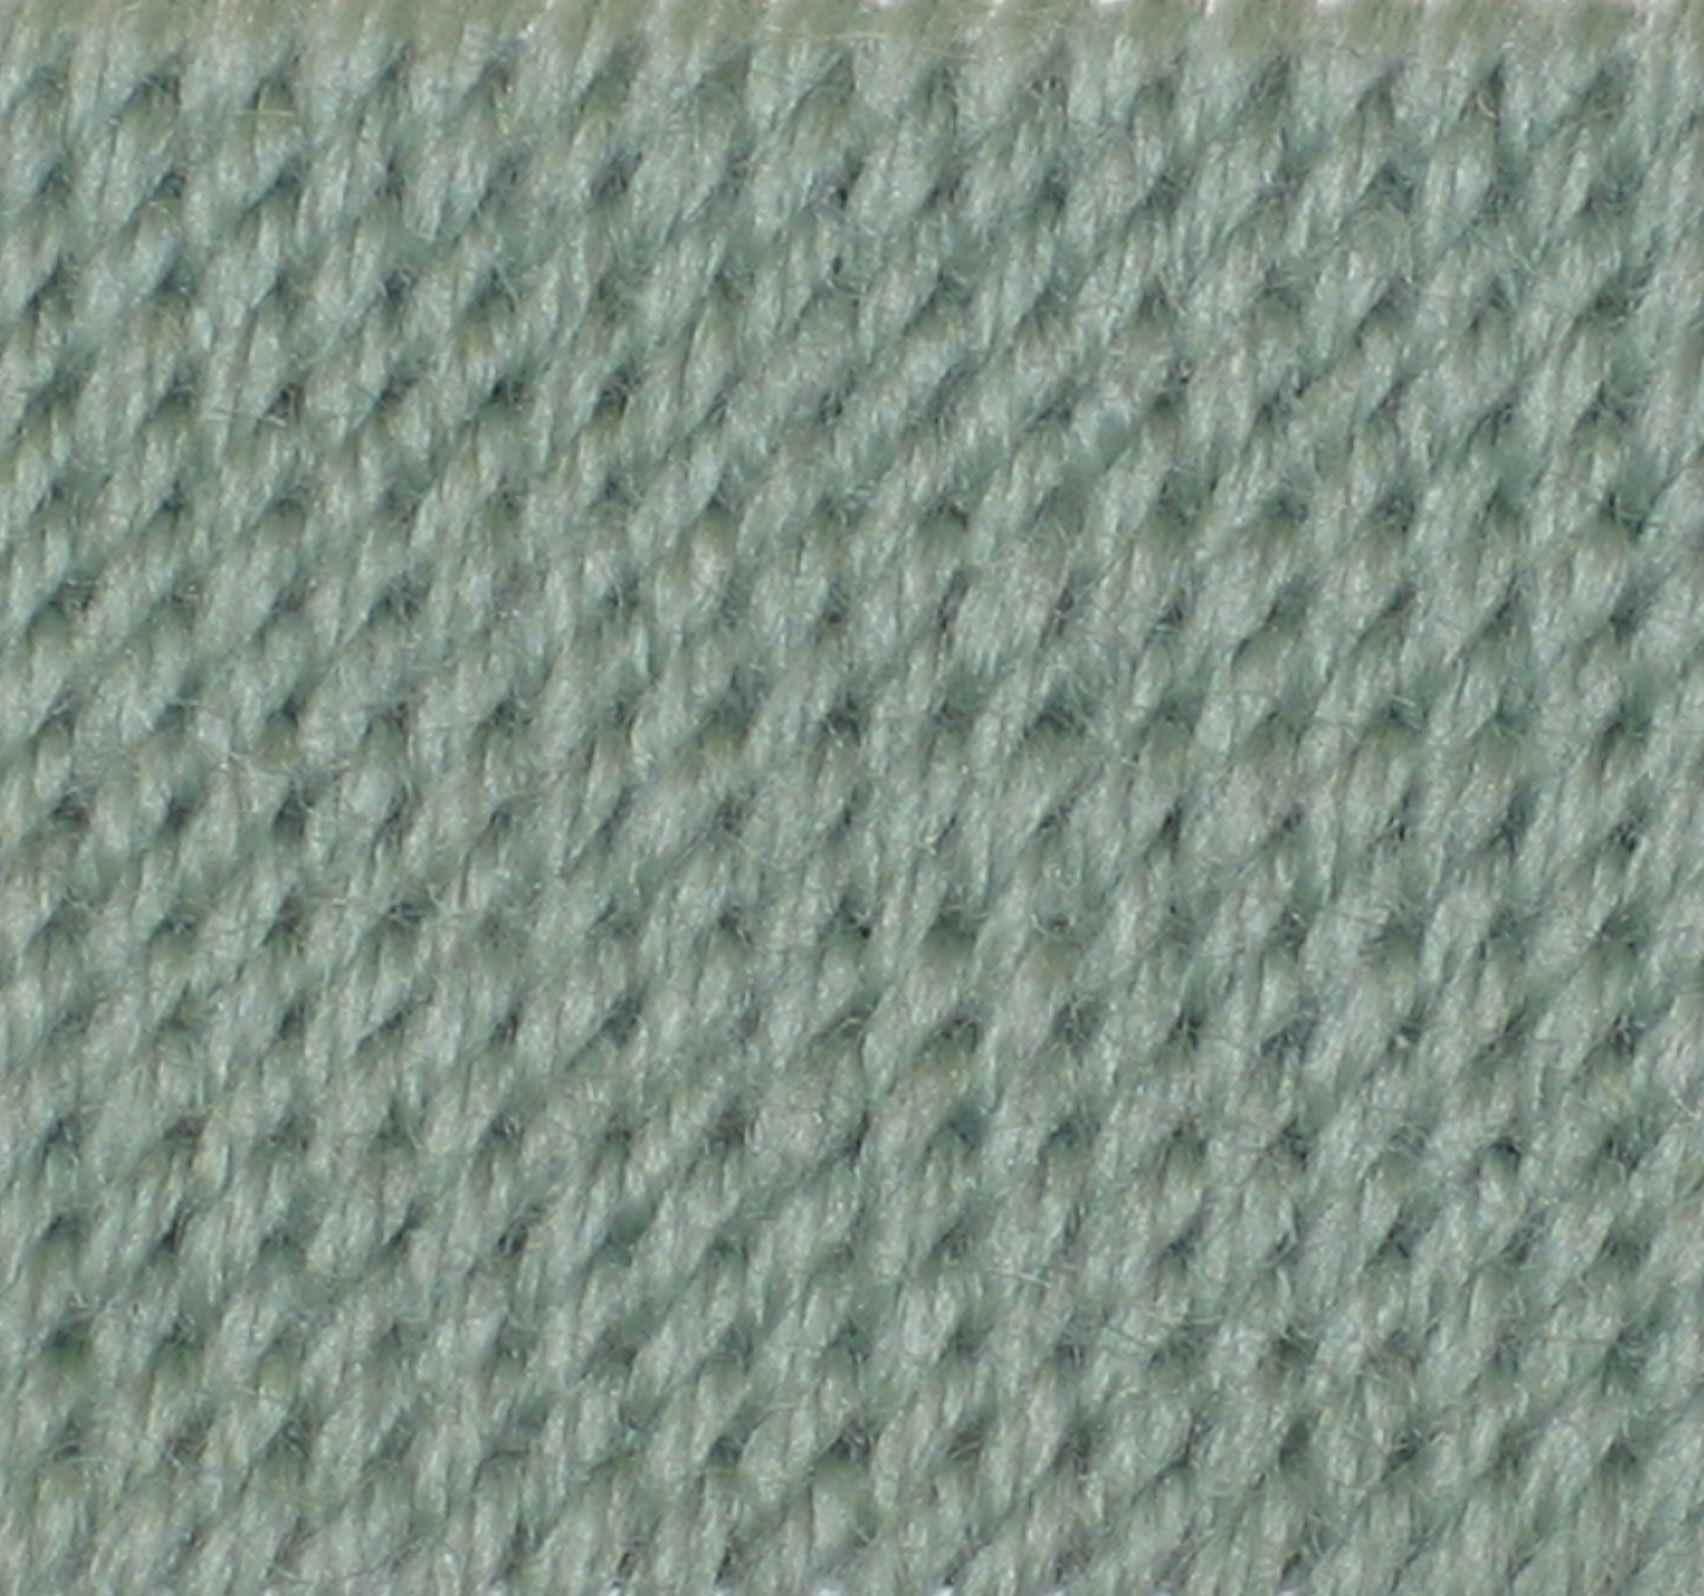 The Encroaching/Interlocking Gobelin Stitch